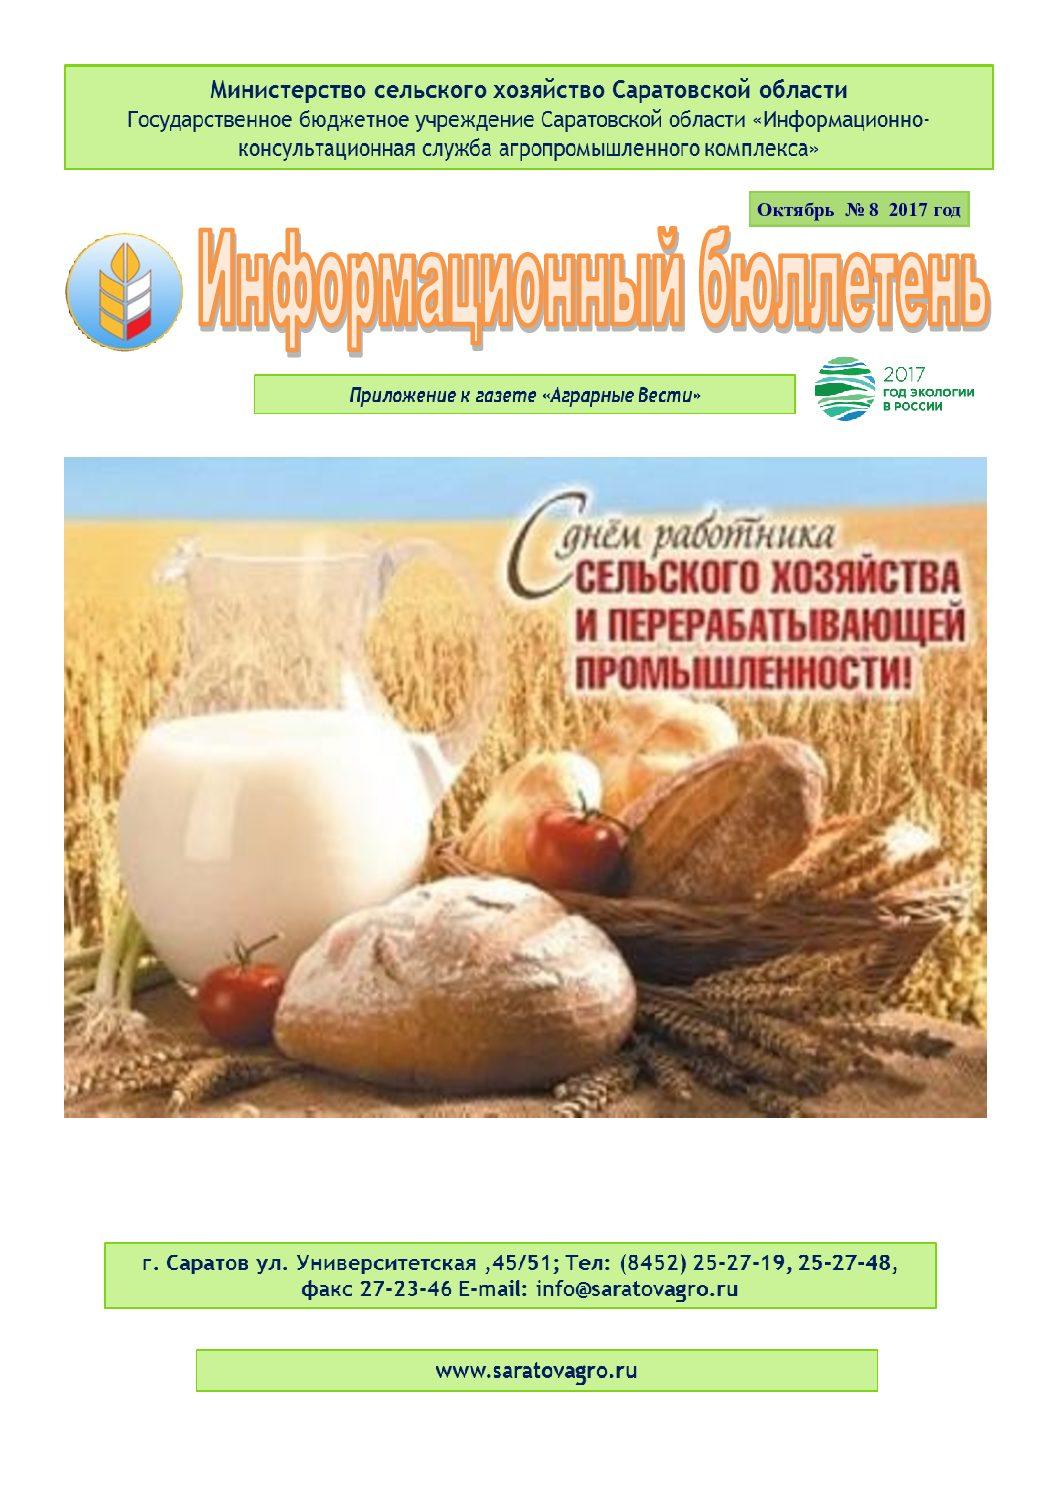 https://saratovagro.ru/wp-content/uploads/2020/08/8.2017-pdf.jpg